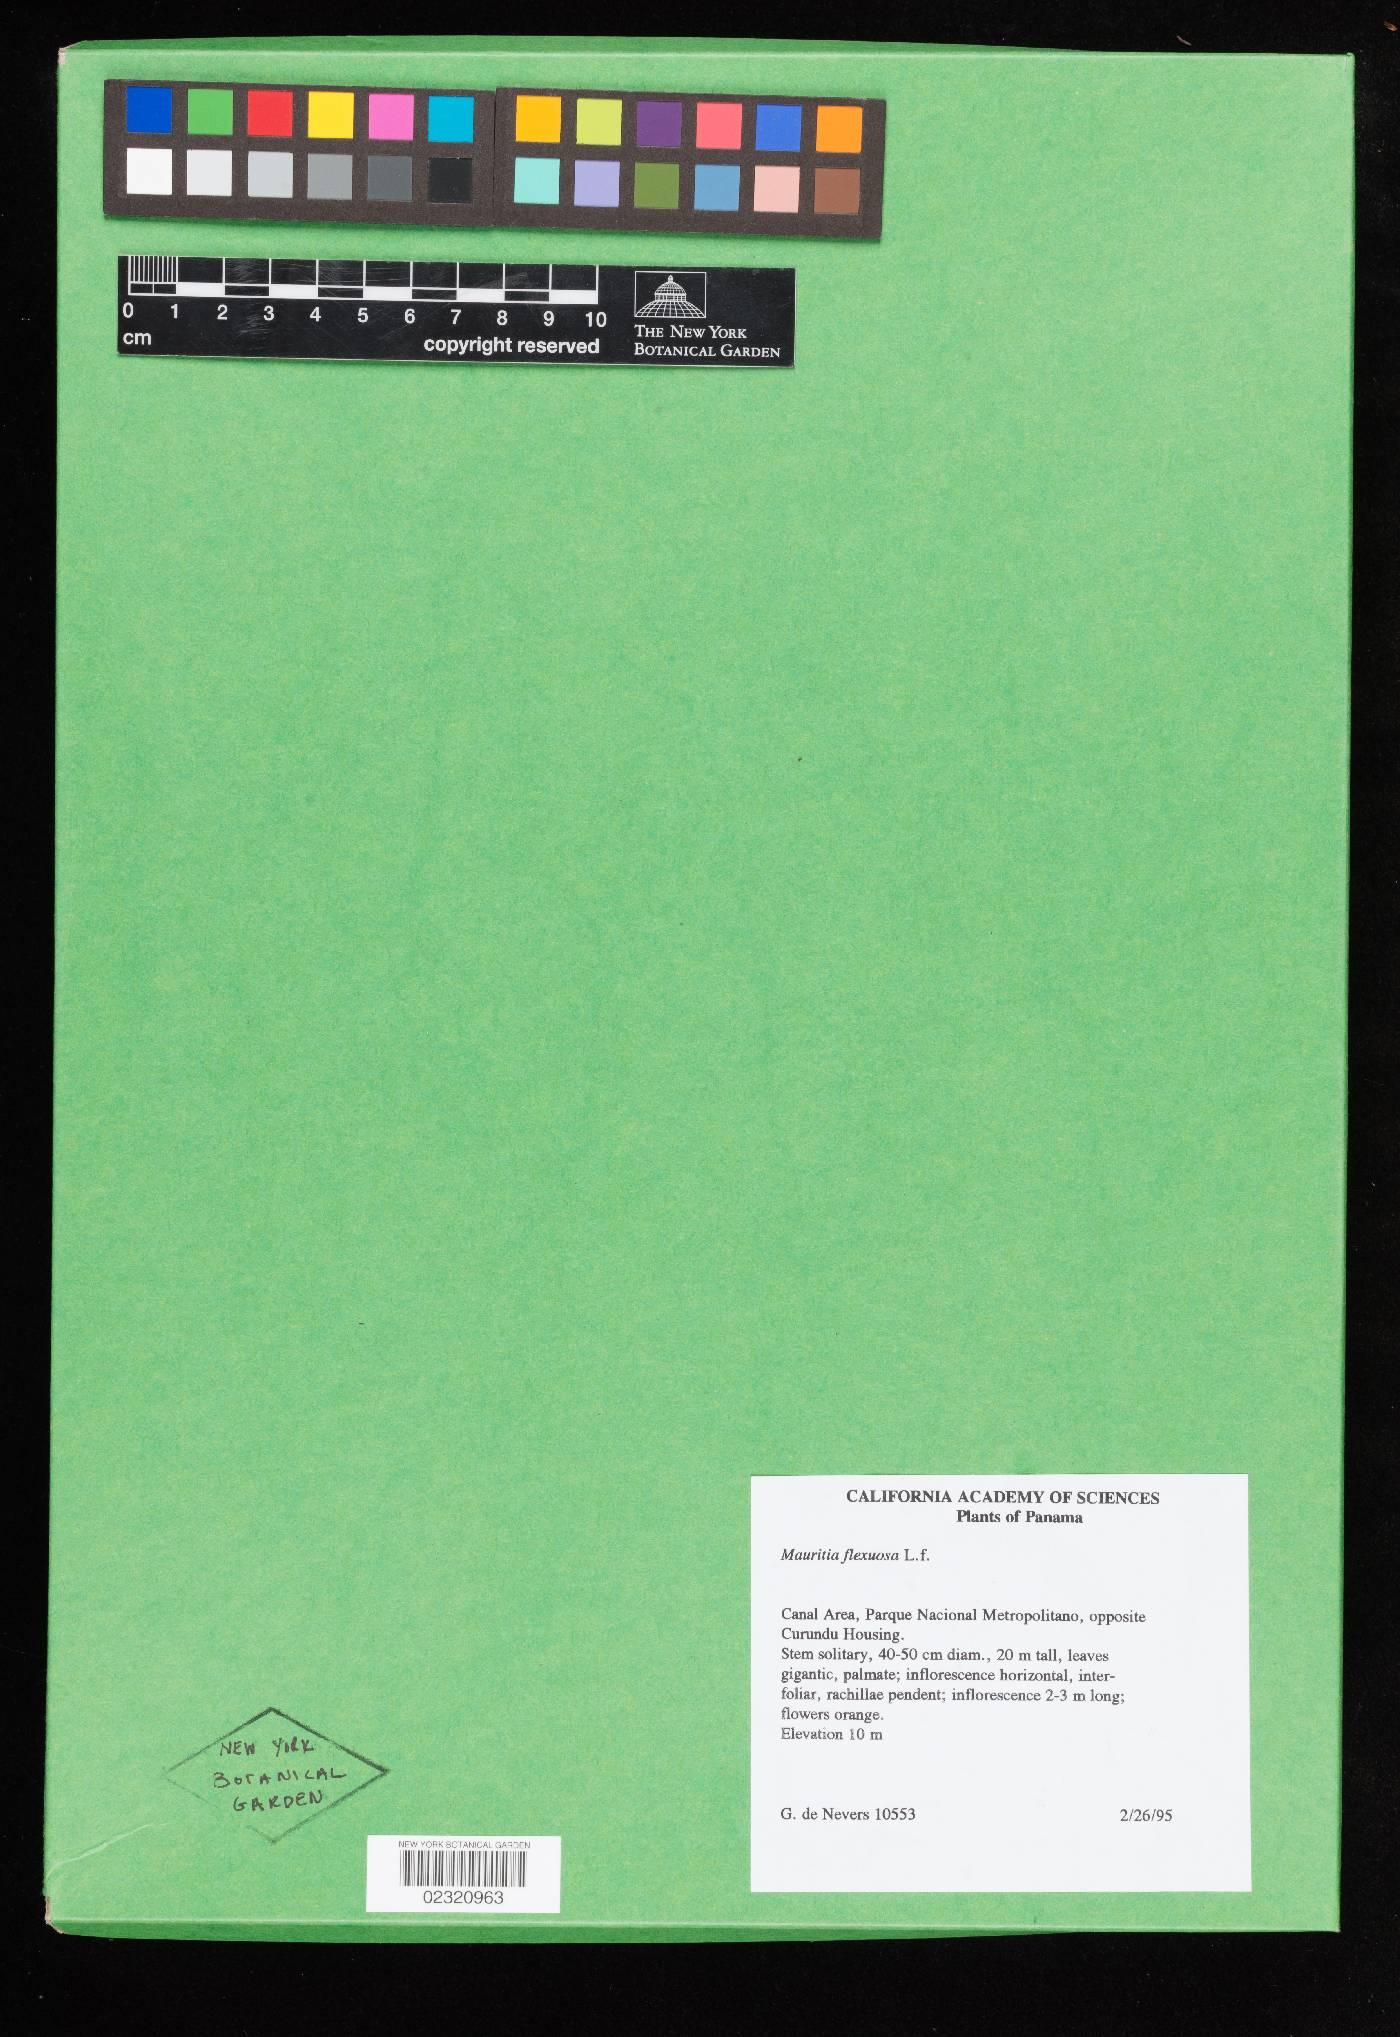 Mauritia flexuosa image